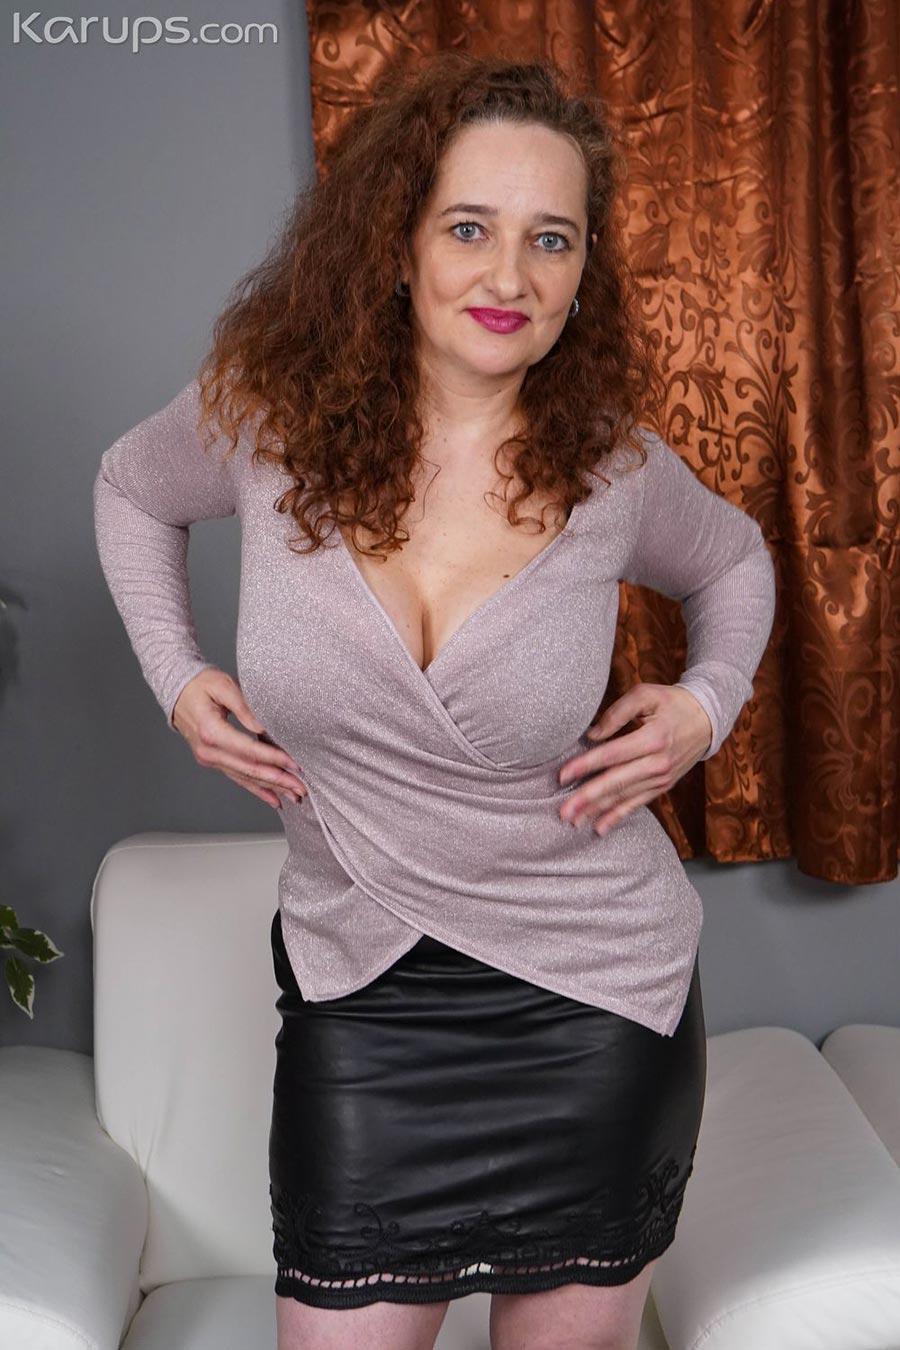 Thick MILF Ameli masturbating at home - Chaturbate News